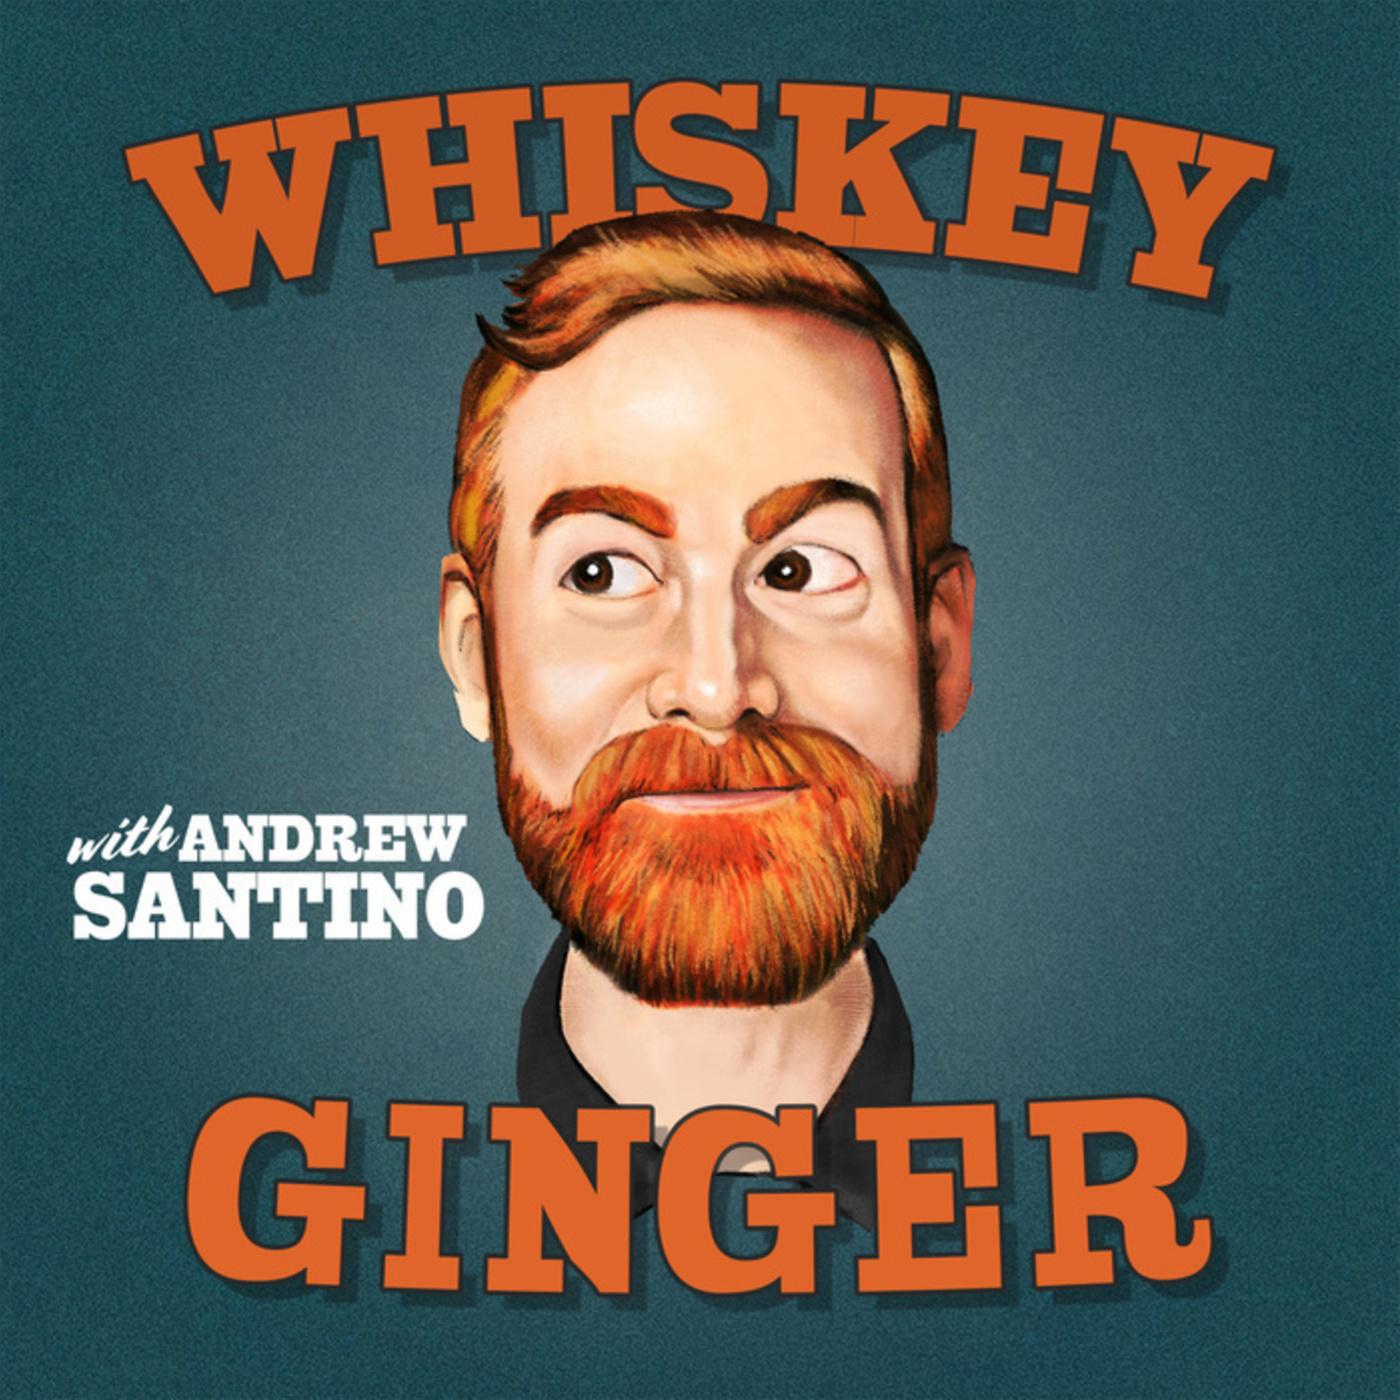 Andrew Santino